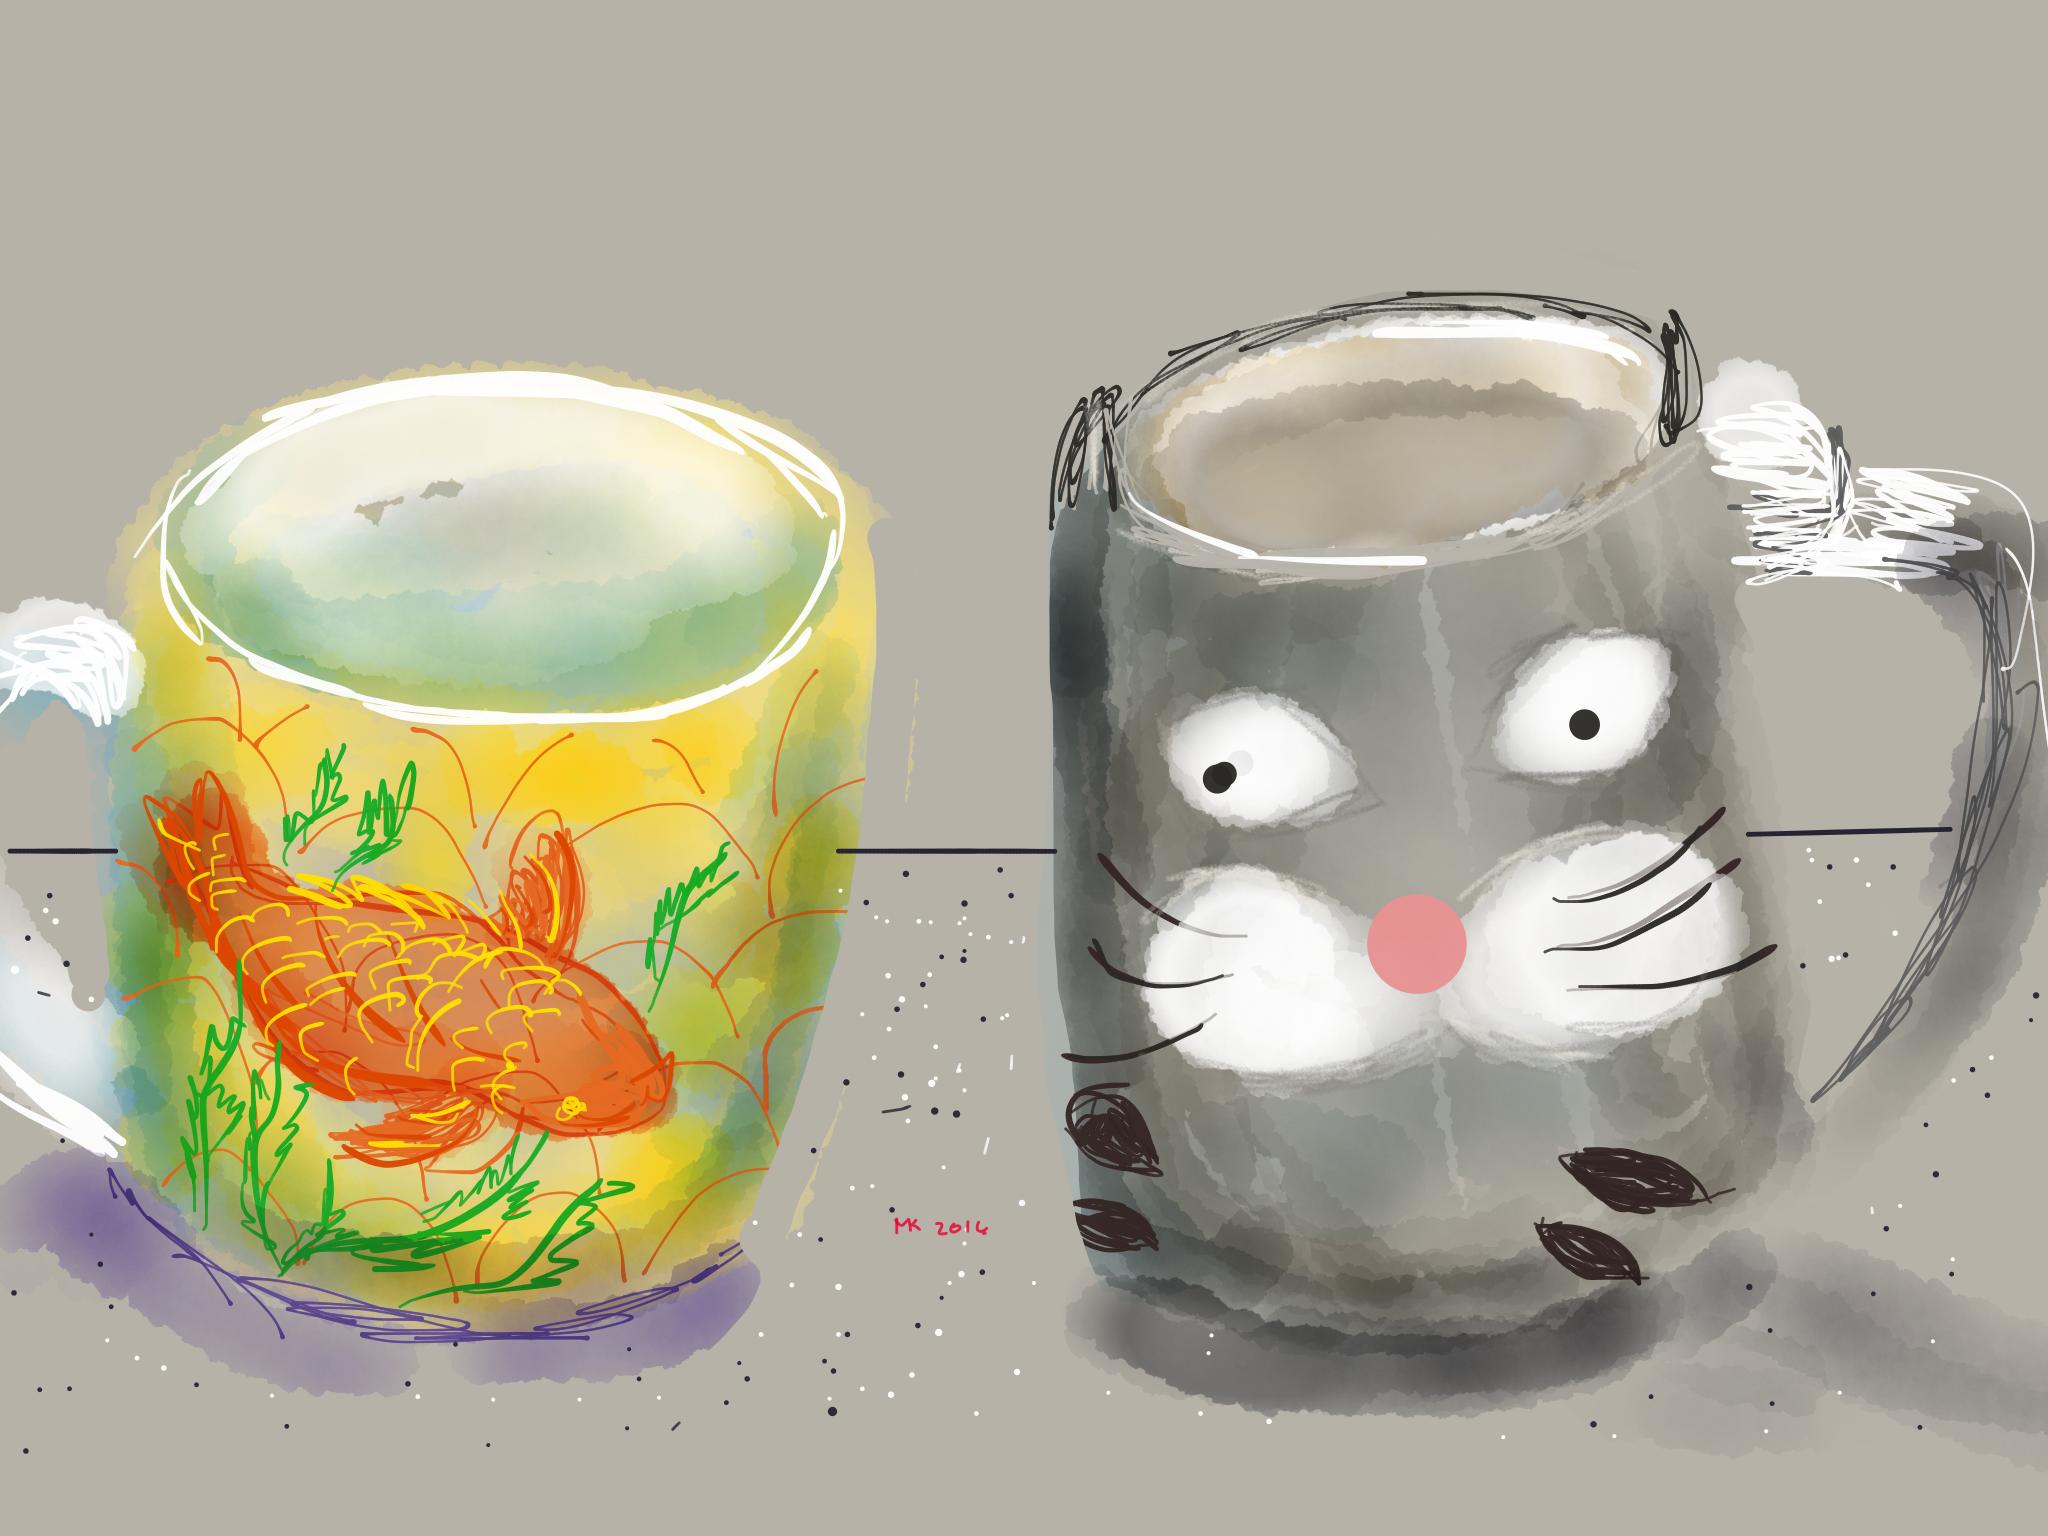 Always time for coffee:  MUG SHOTS